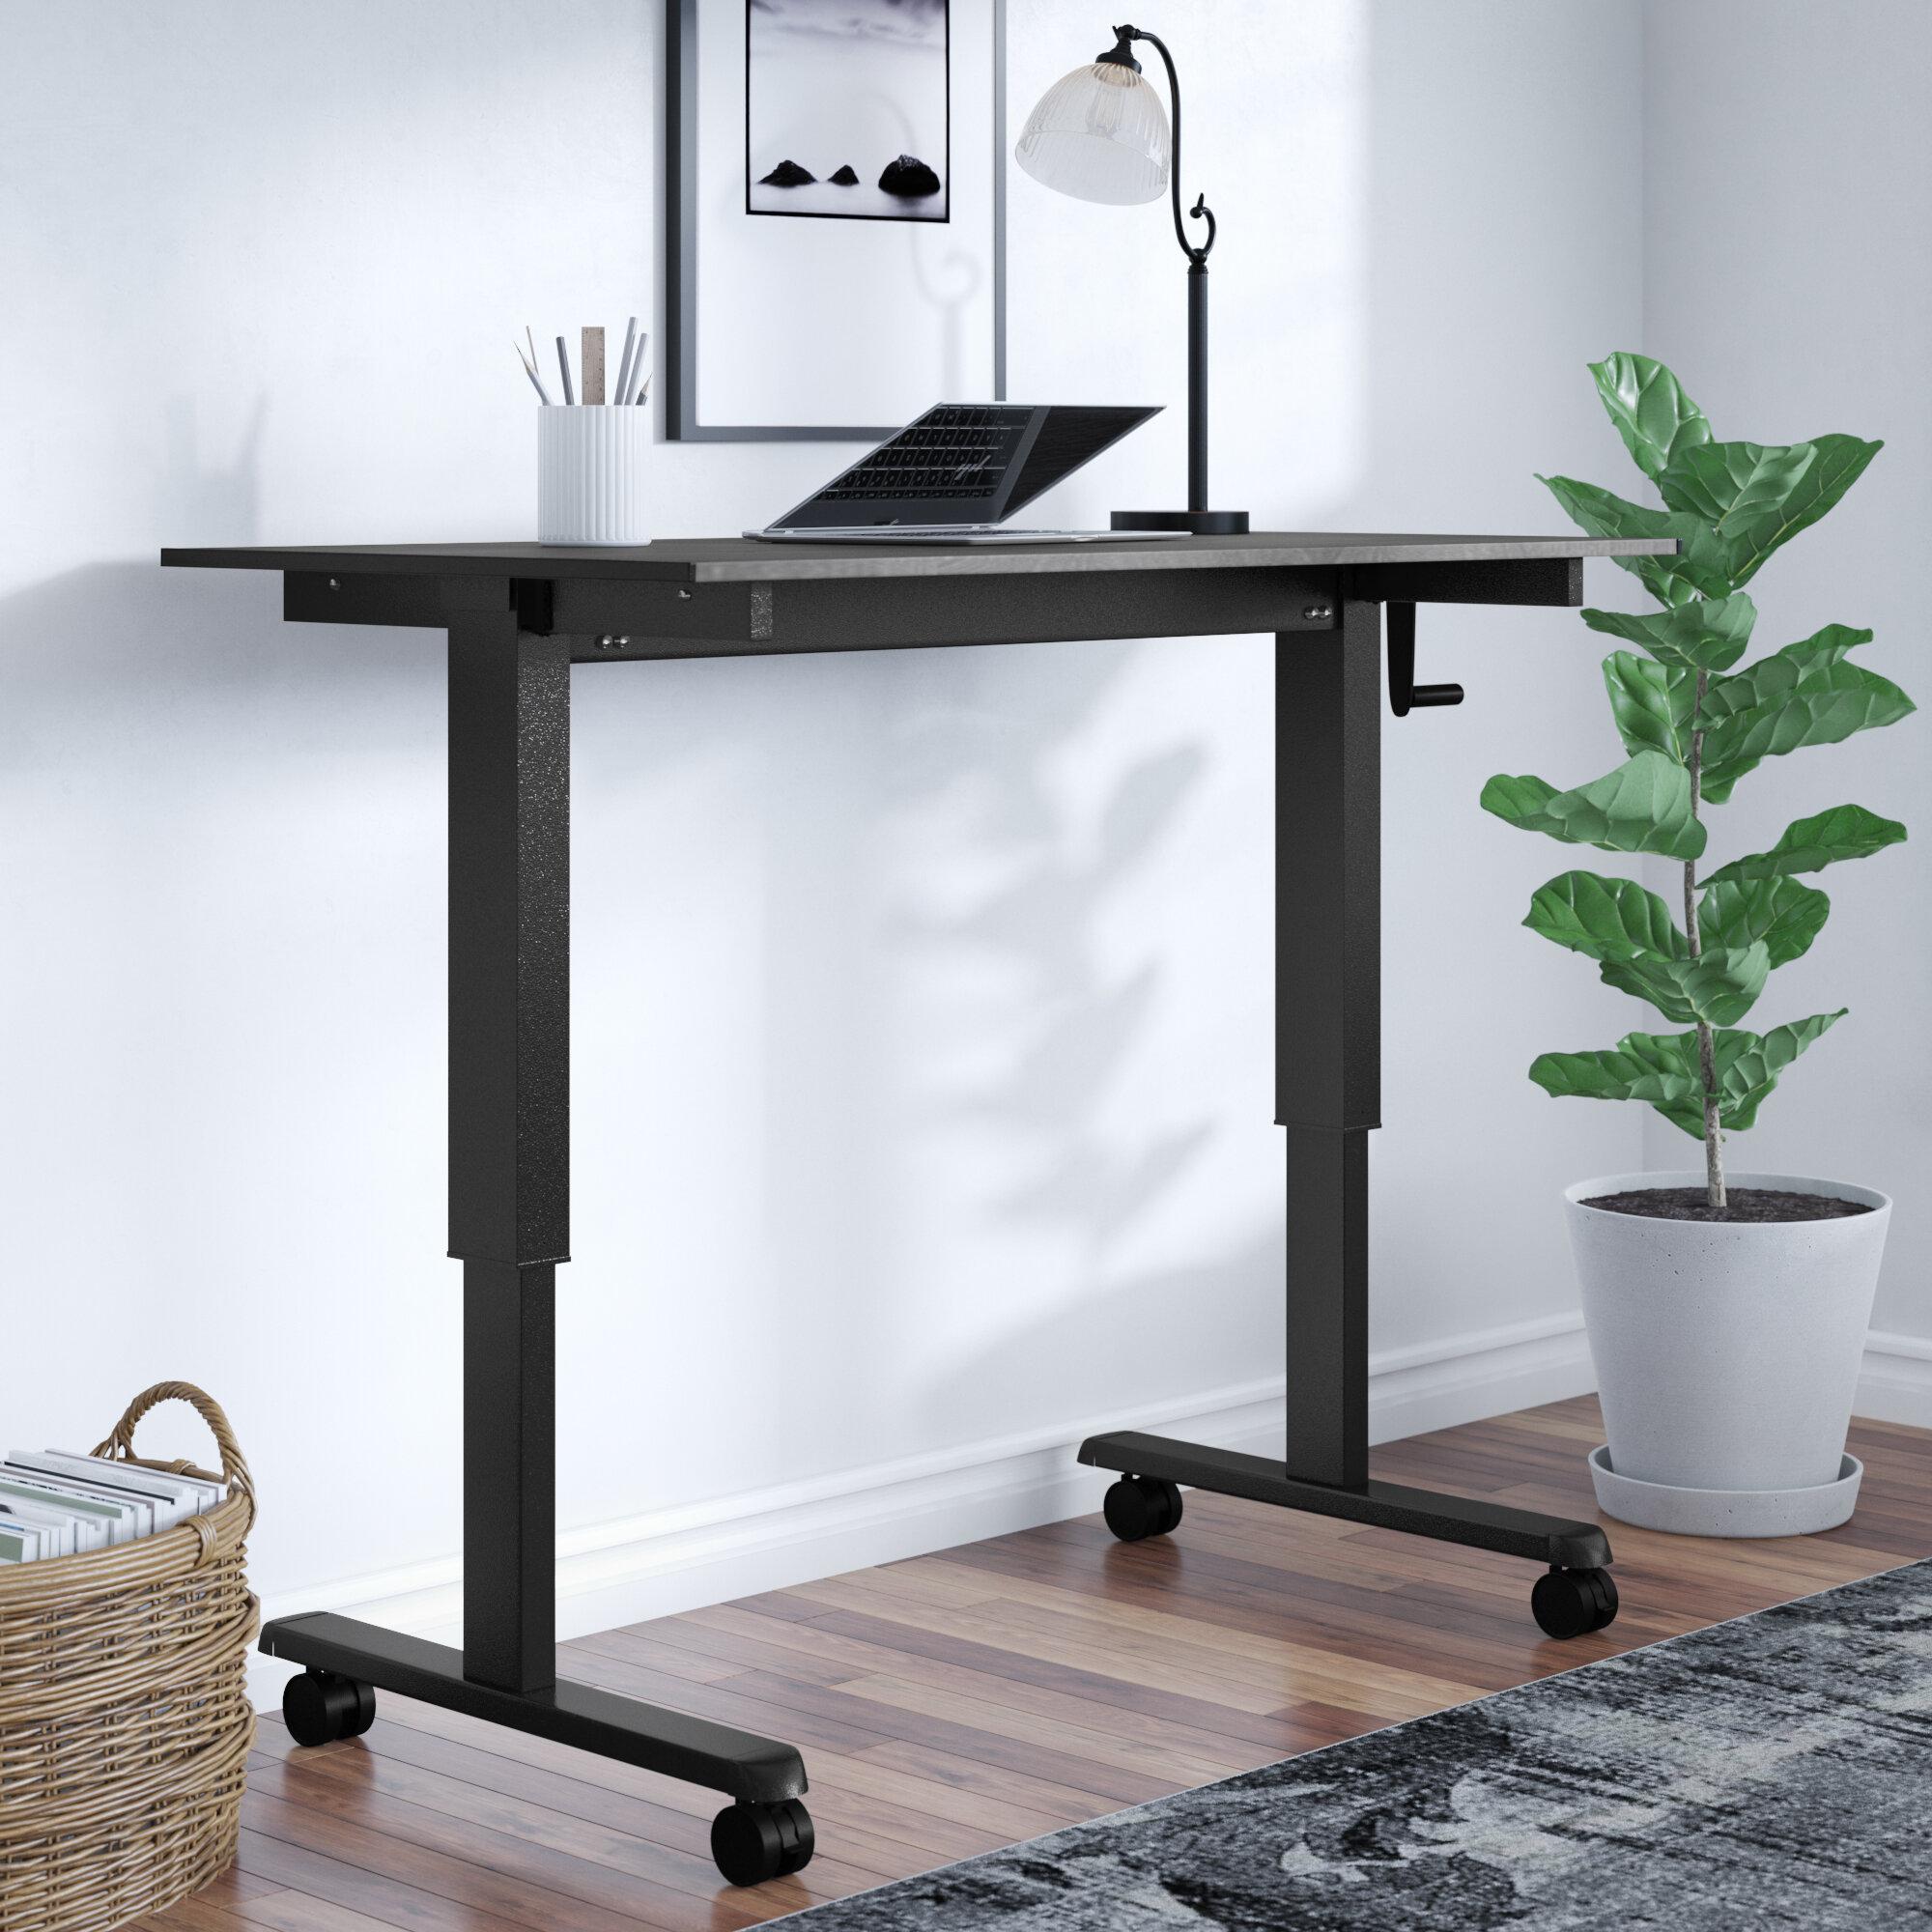 Symple Stuff Belvedere Height Adjustable Standing Desk Reviews Wayfair